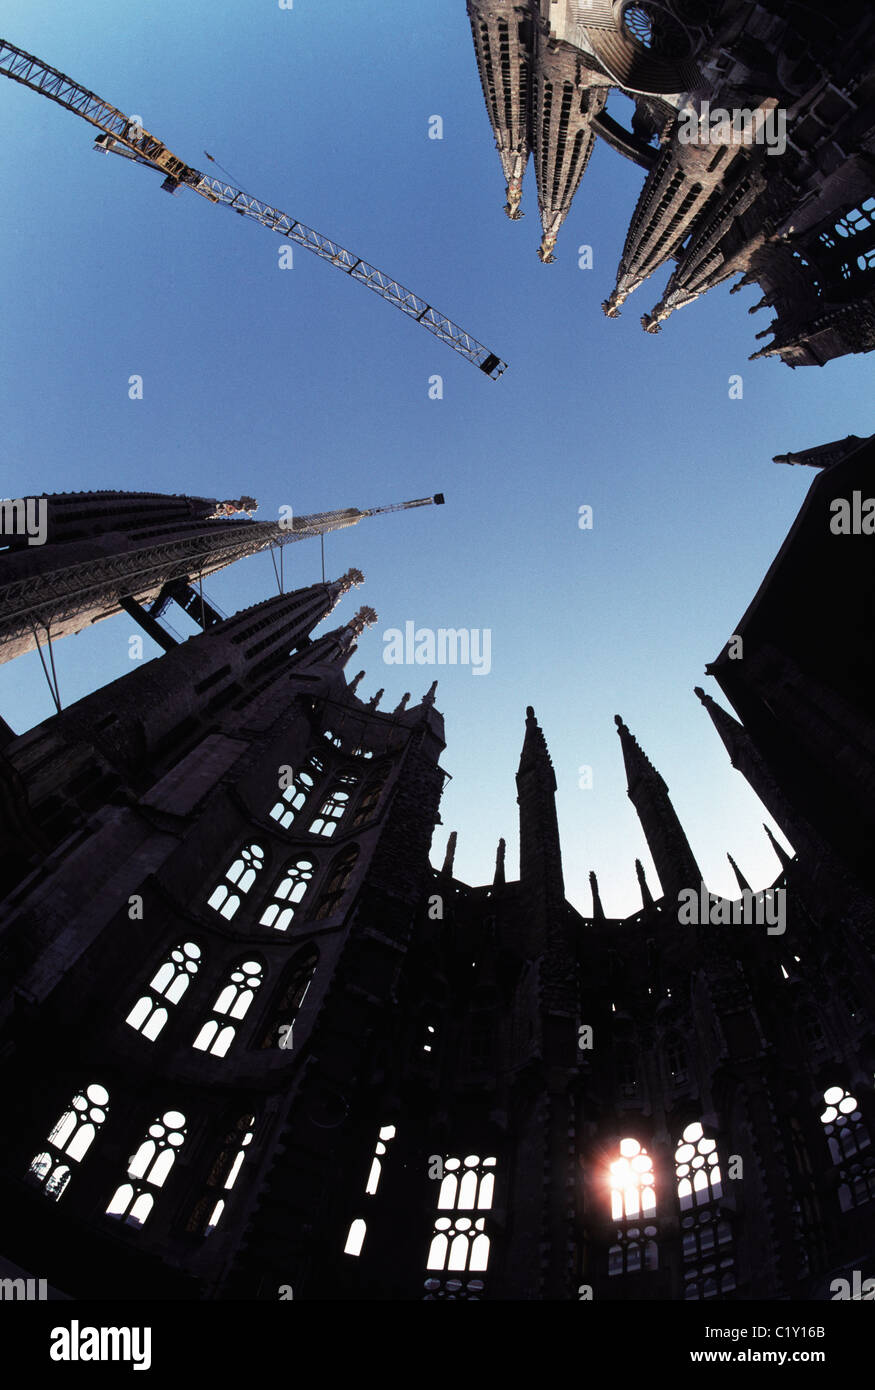 Interior of partially built Sagrada Familia Cathedral in Barcelona - Stock Image